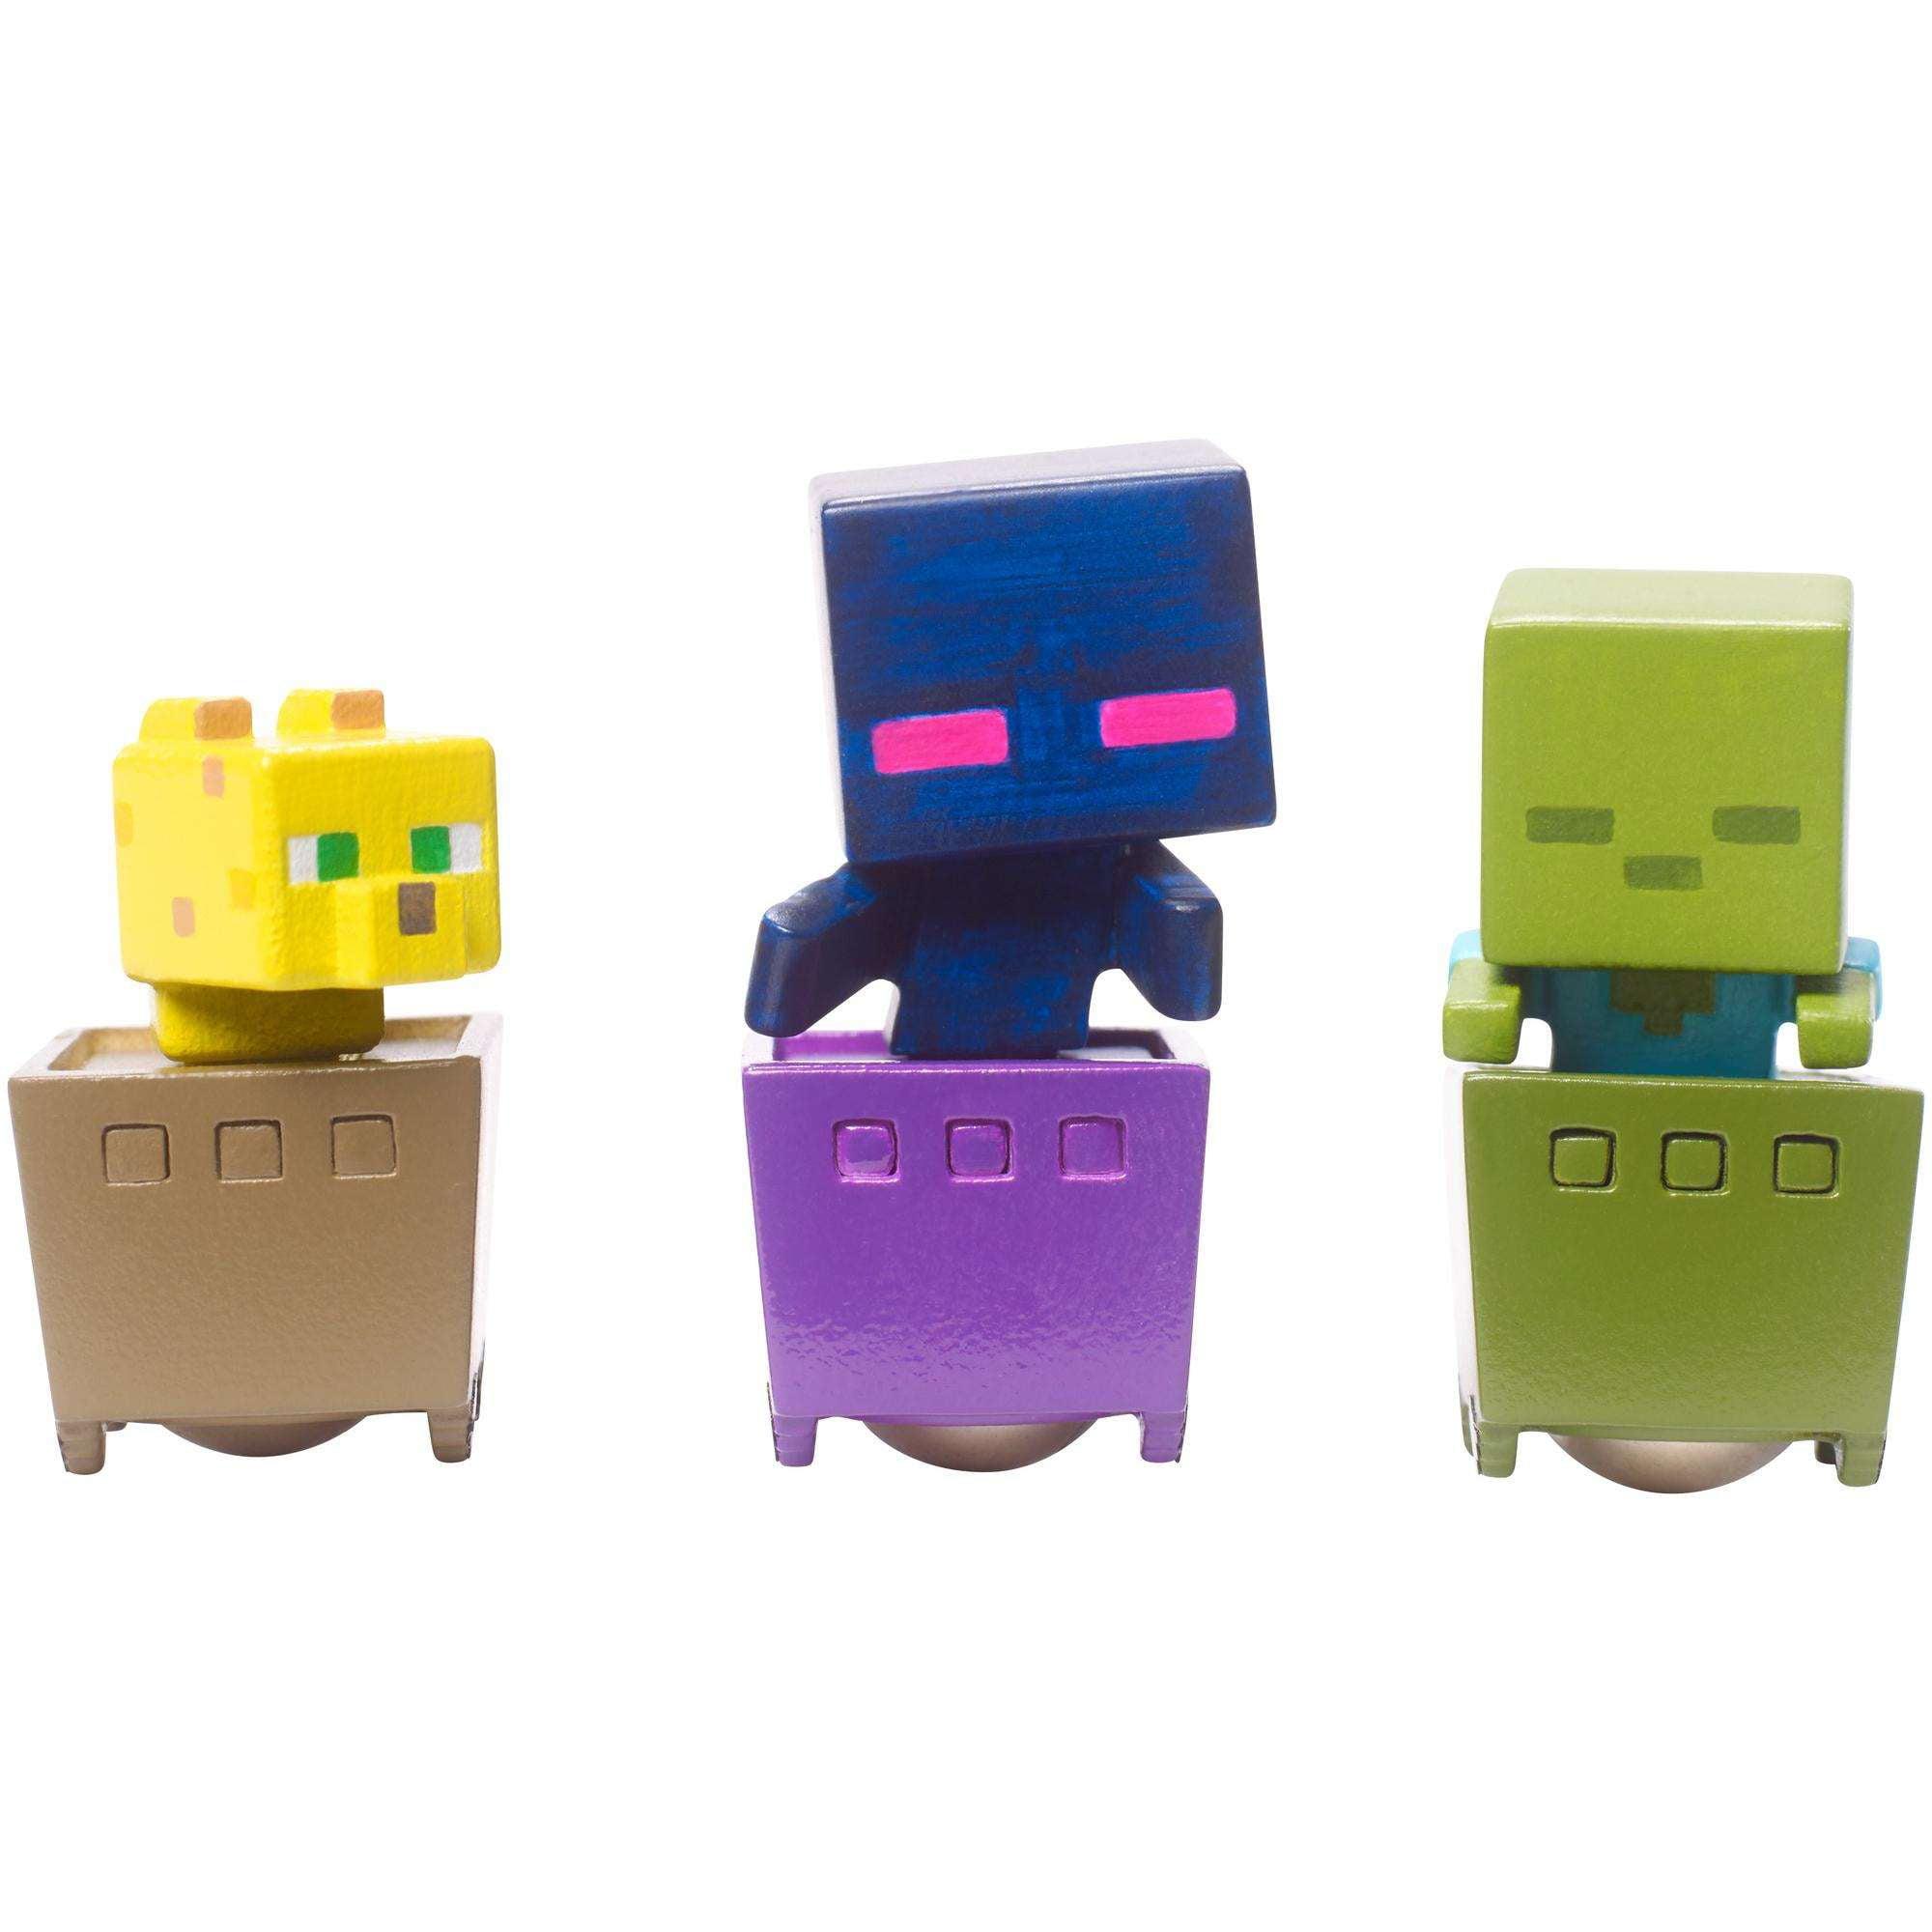 Minecraft Minecart Mini-Figure Ocelot, Zombie, And Enderman 3-Pack by Mattel